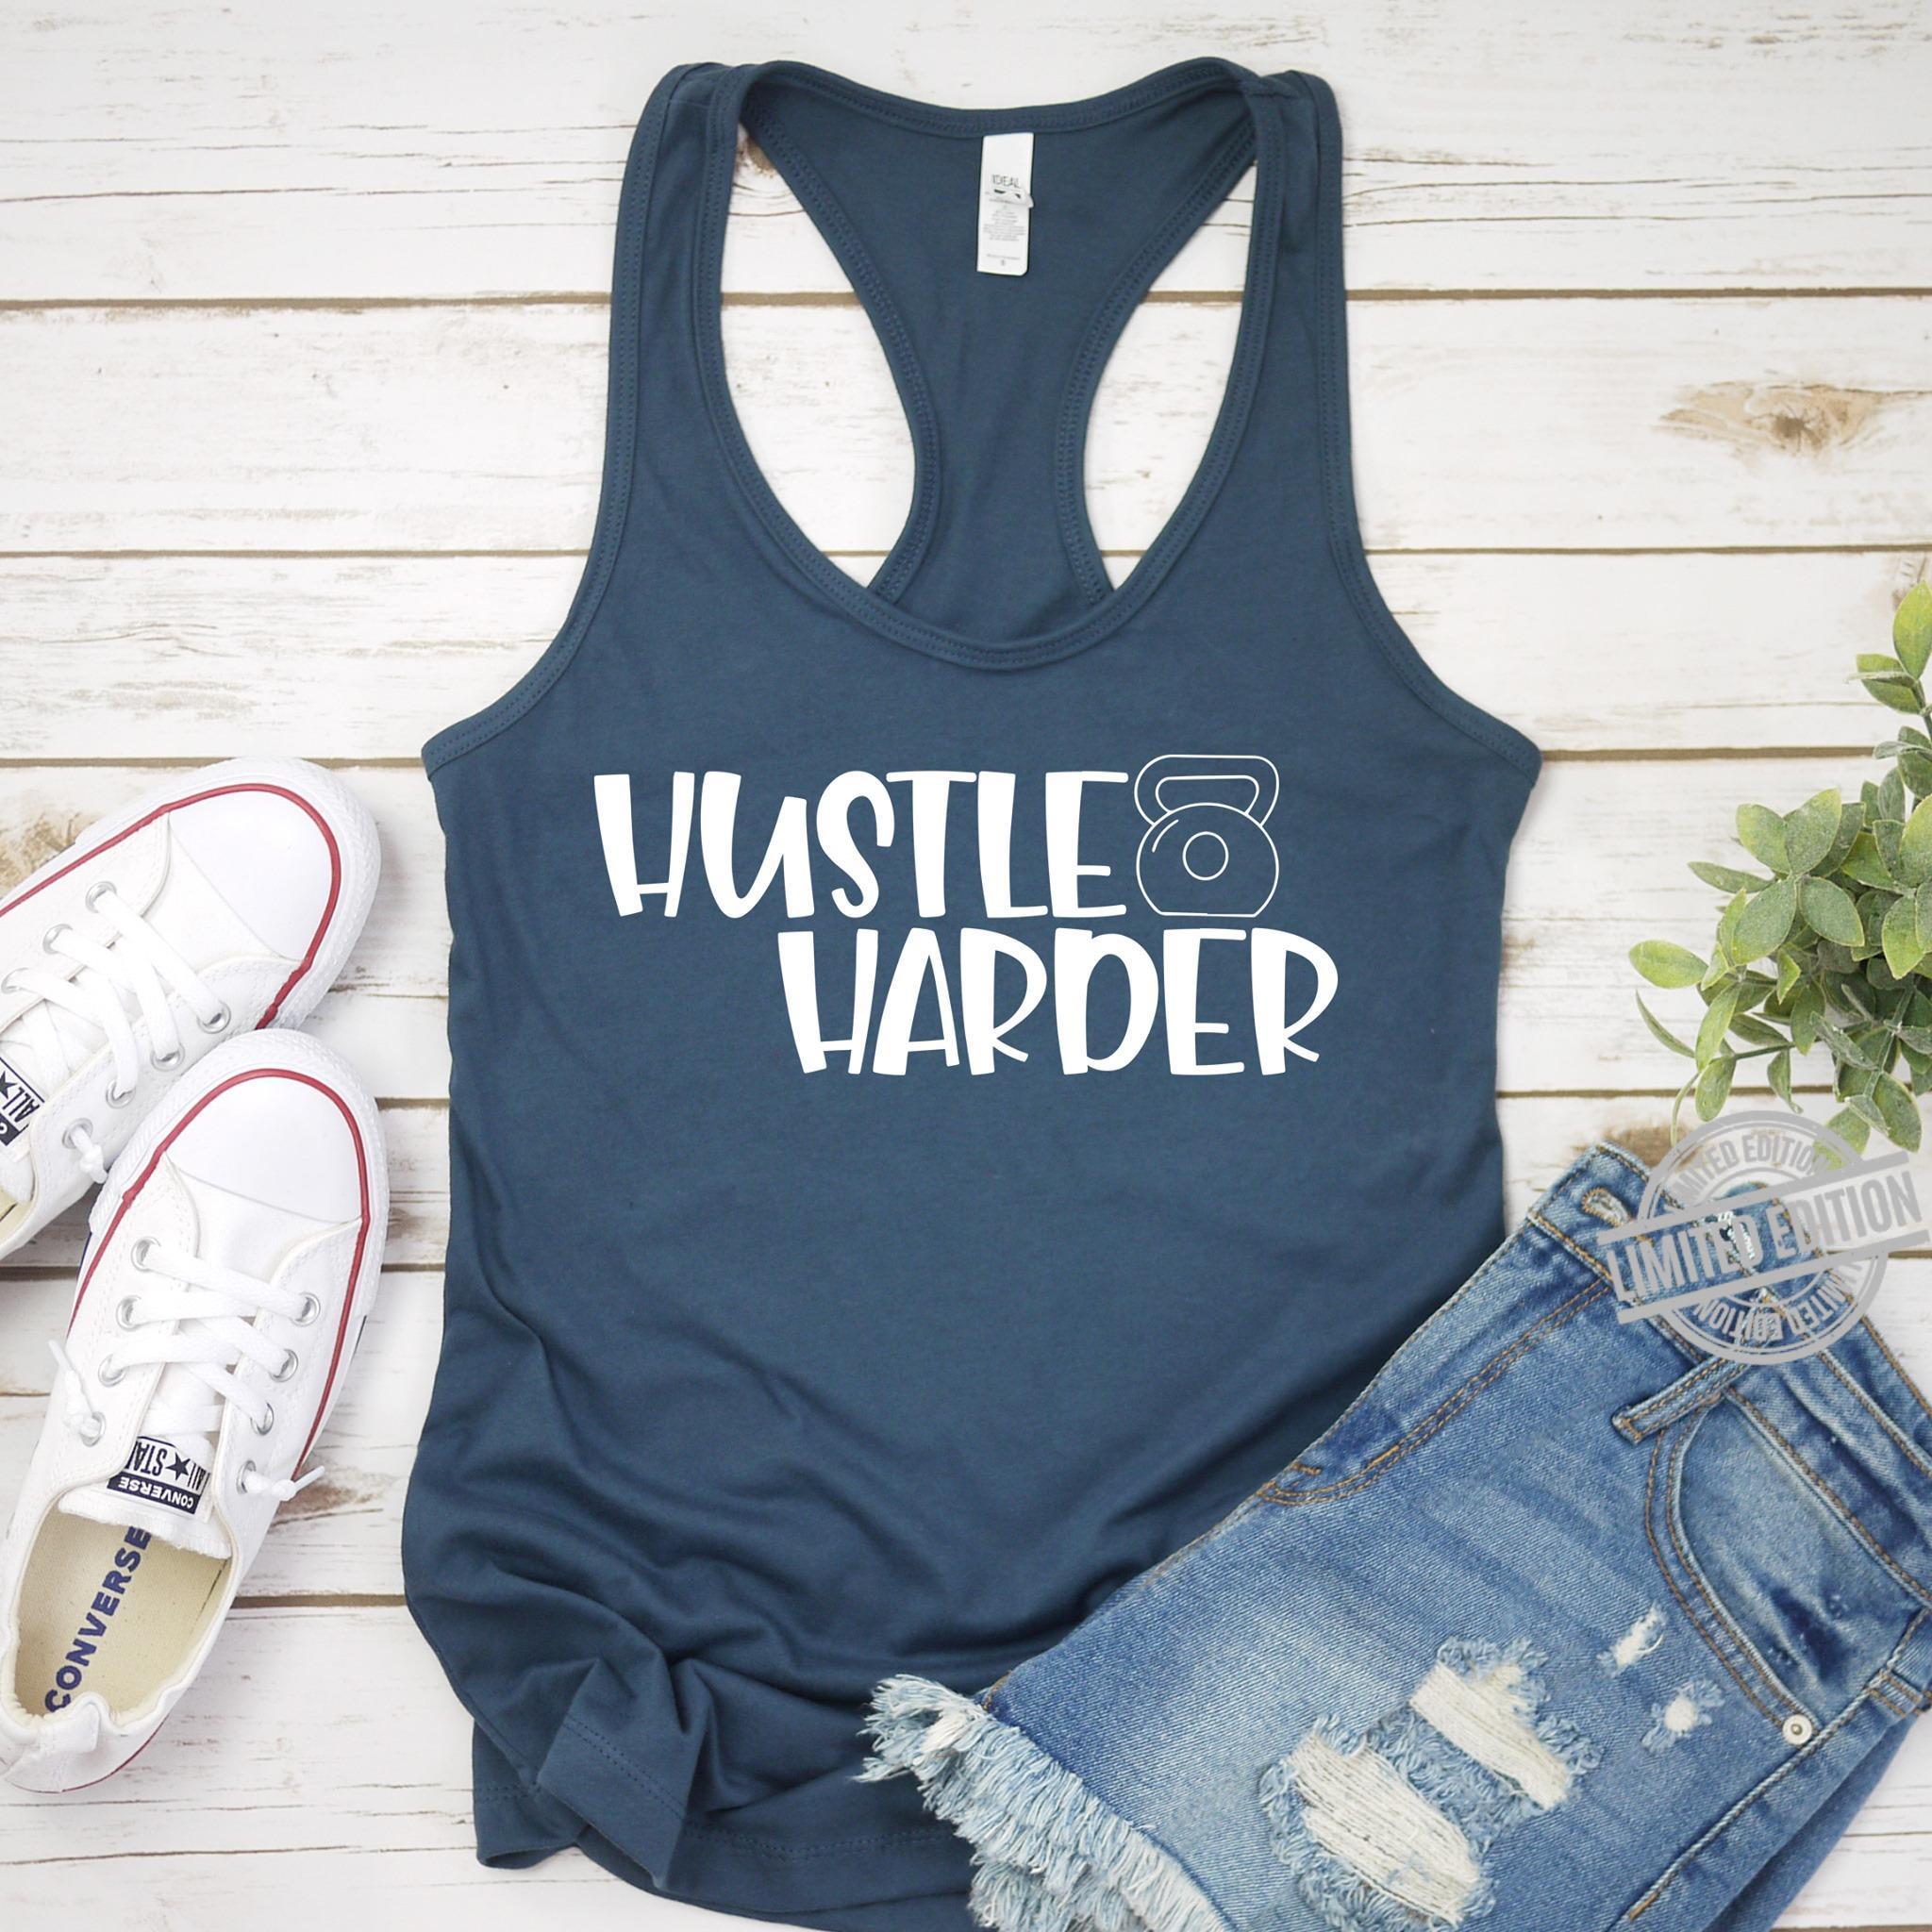 Hustle Harder Shirt